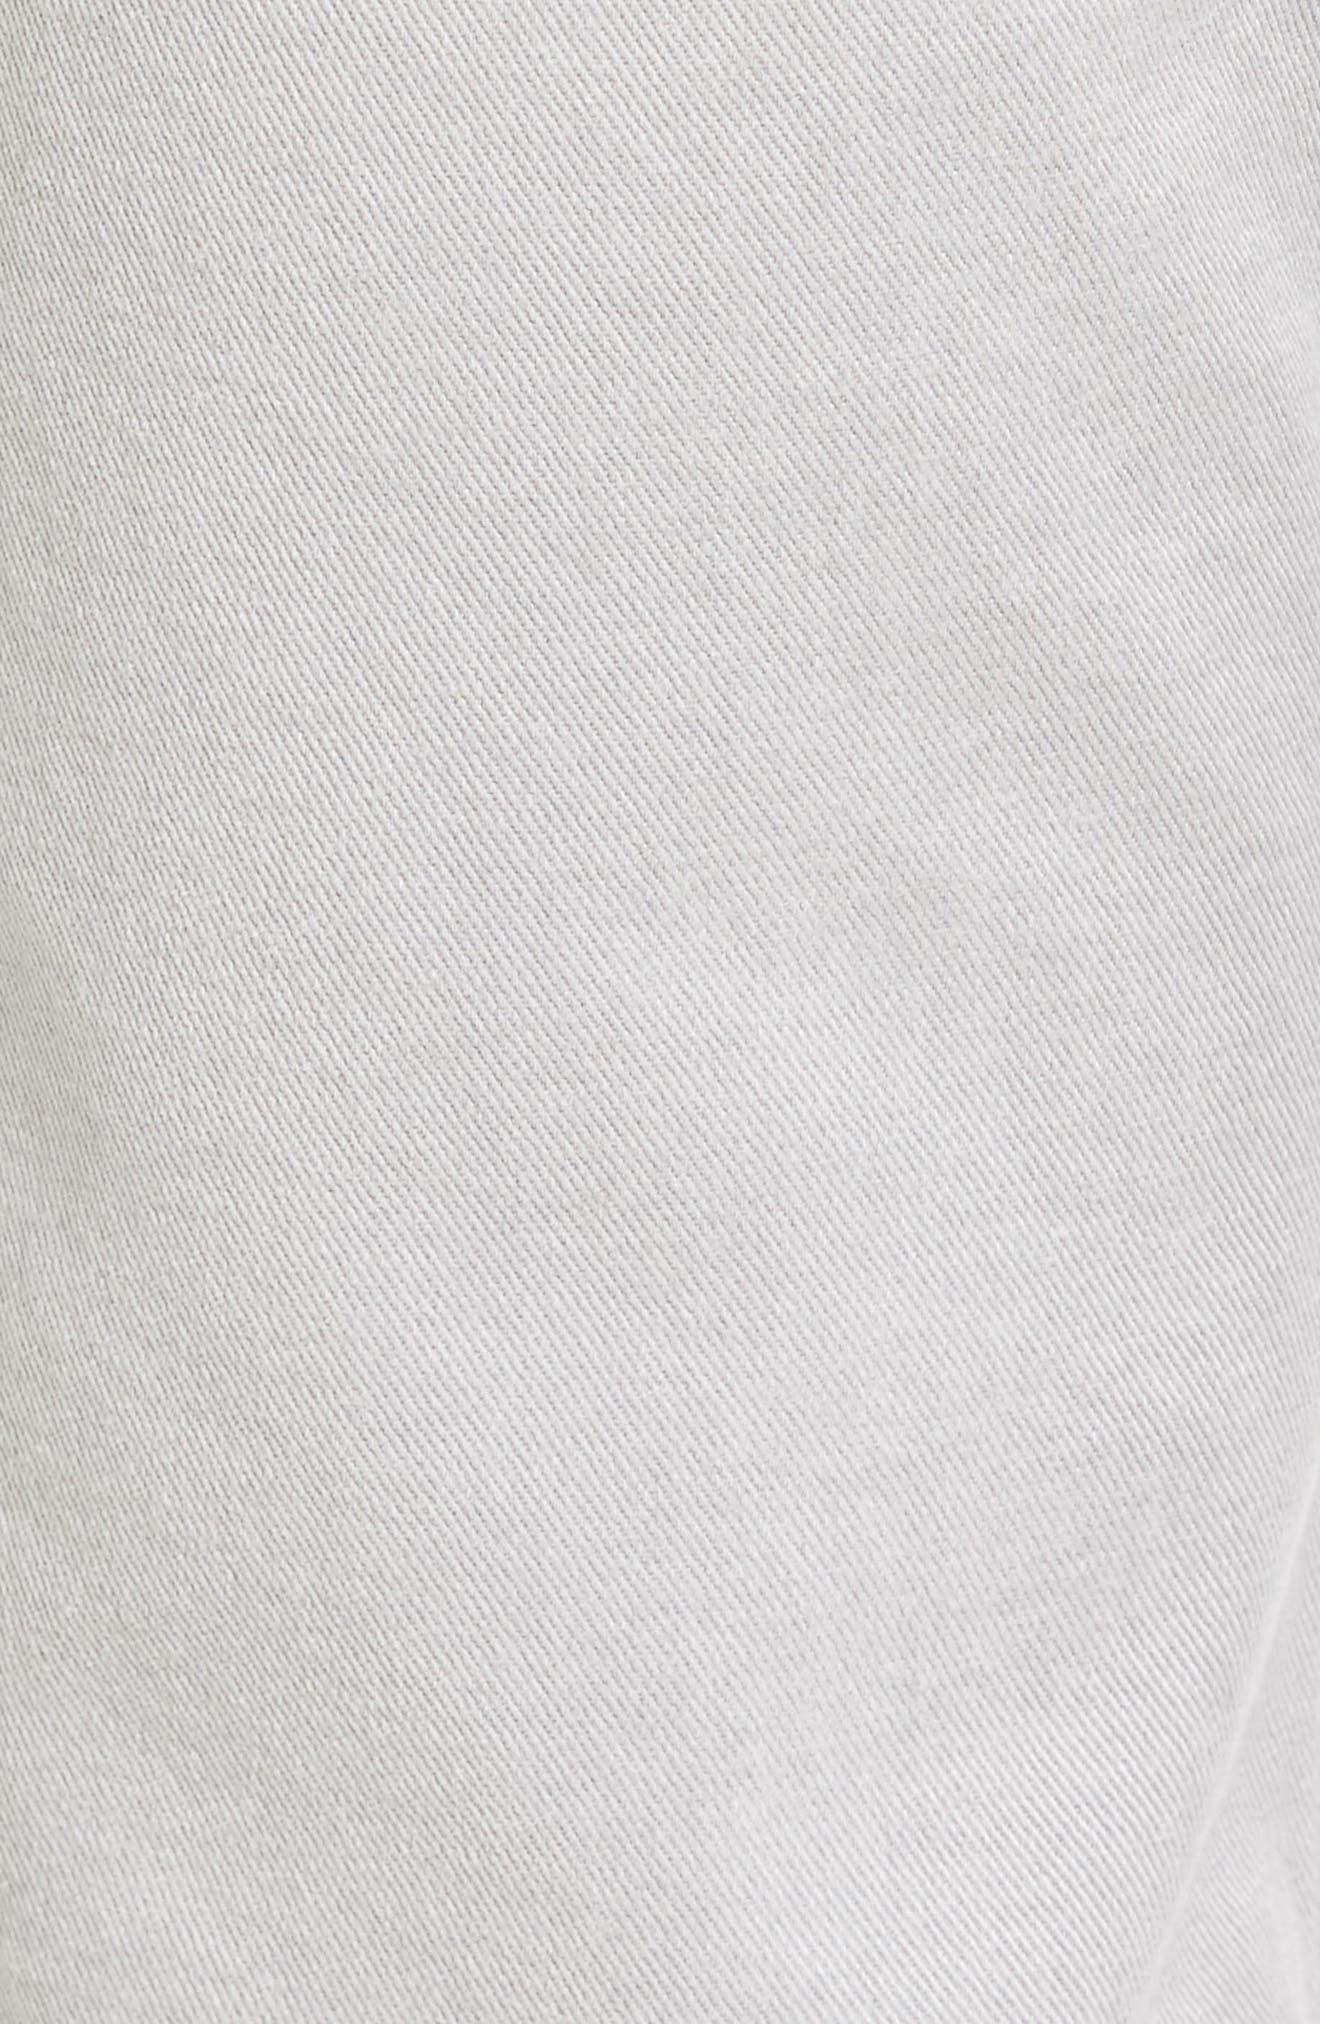 Delaware Grey Slim Fit Jeans,                             Alternate thumbnail 5, color,                             072